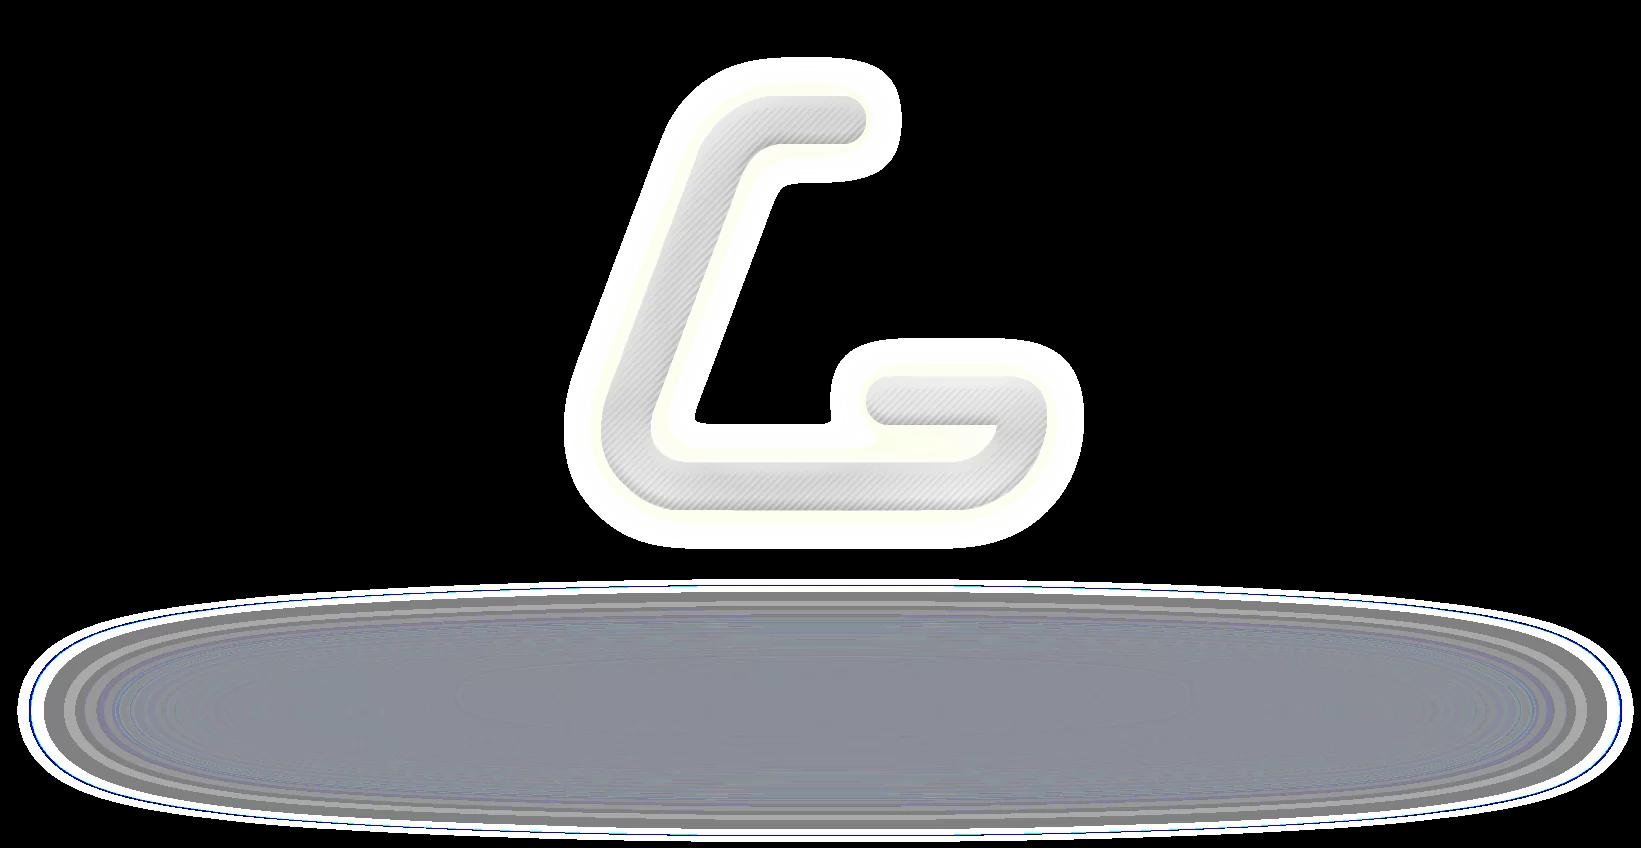 kugoo_logo_21.webp